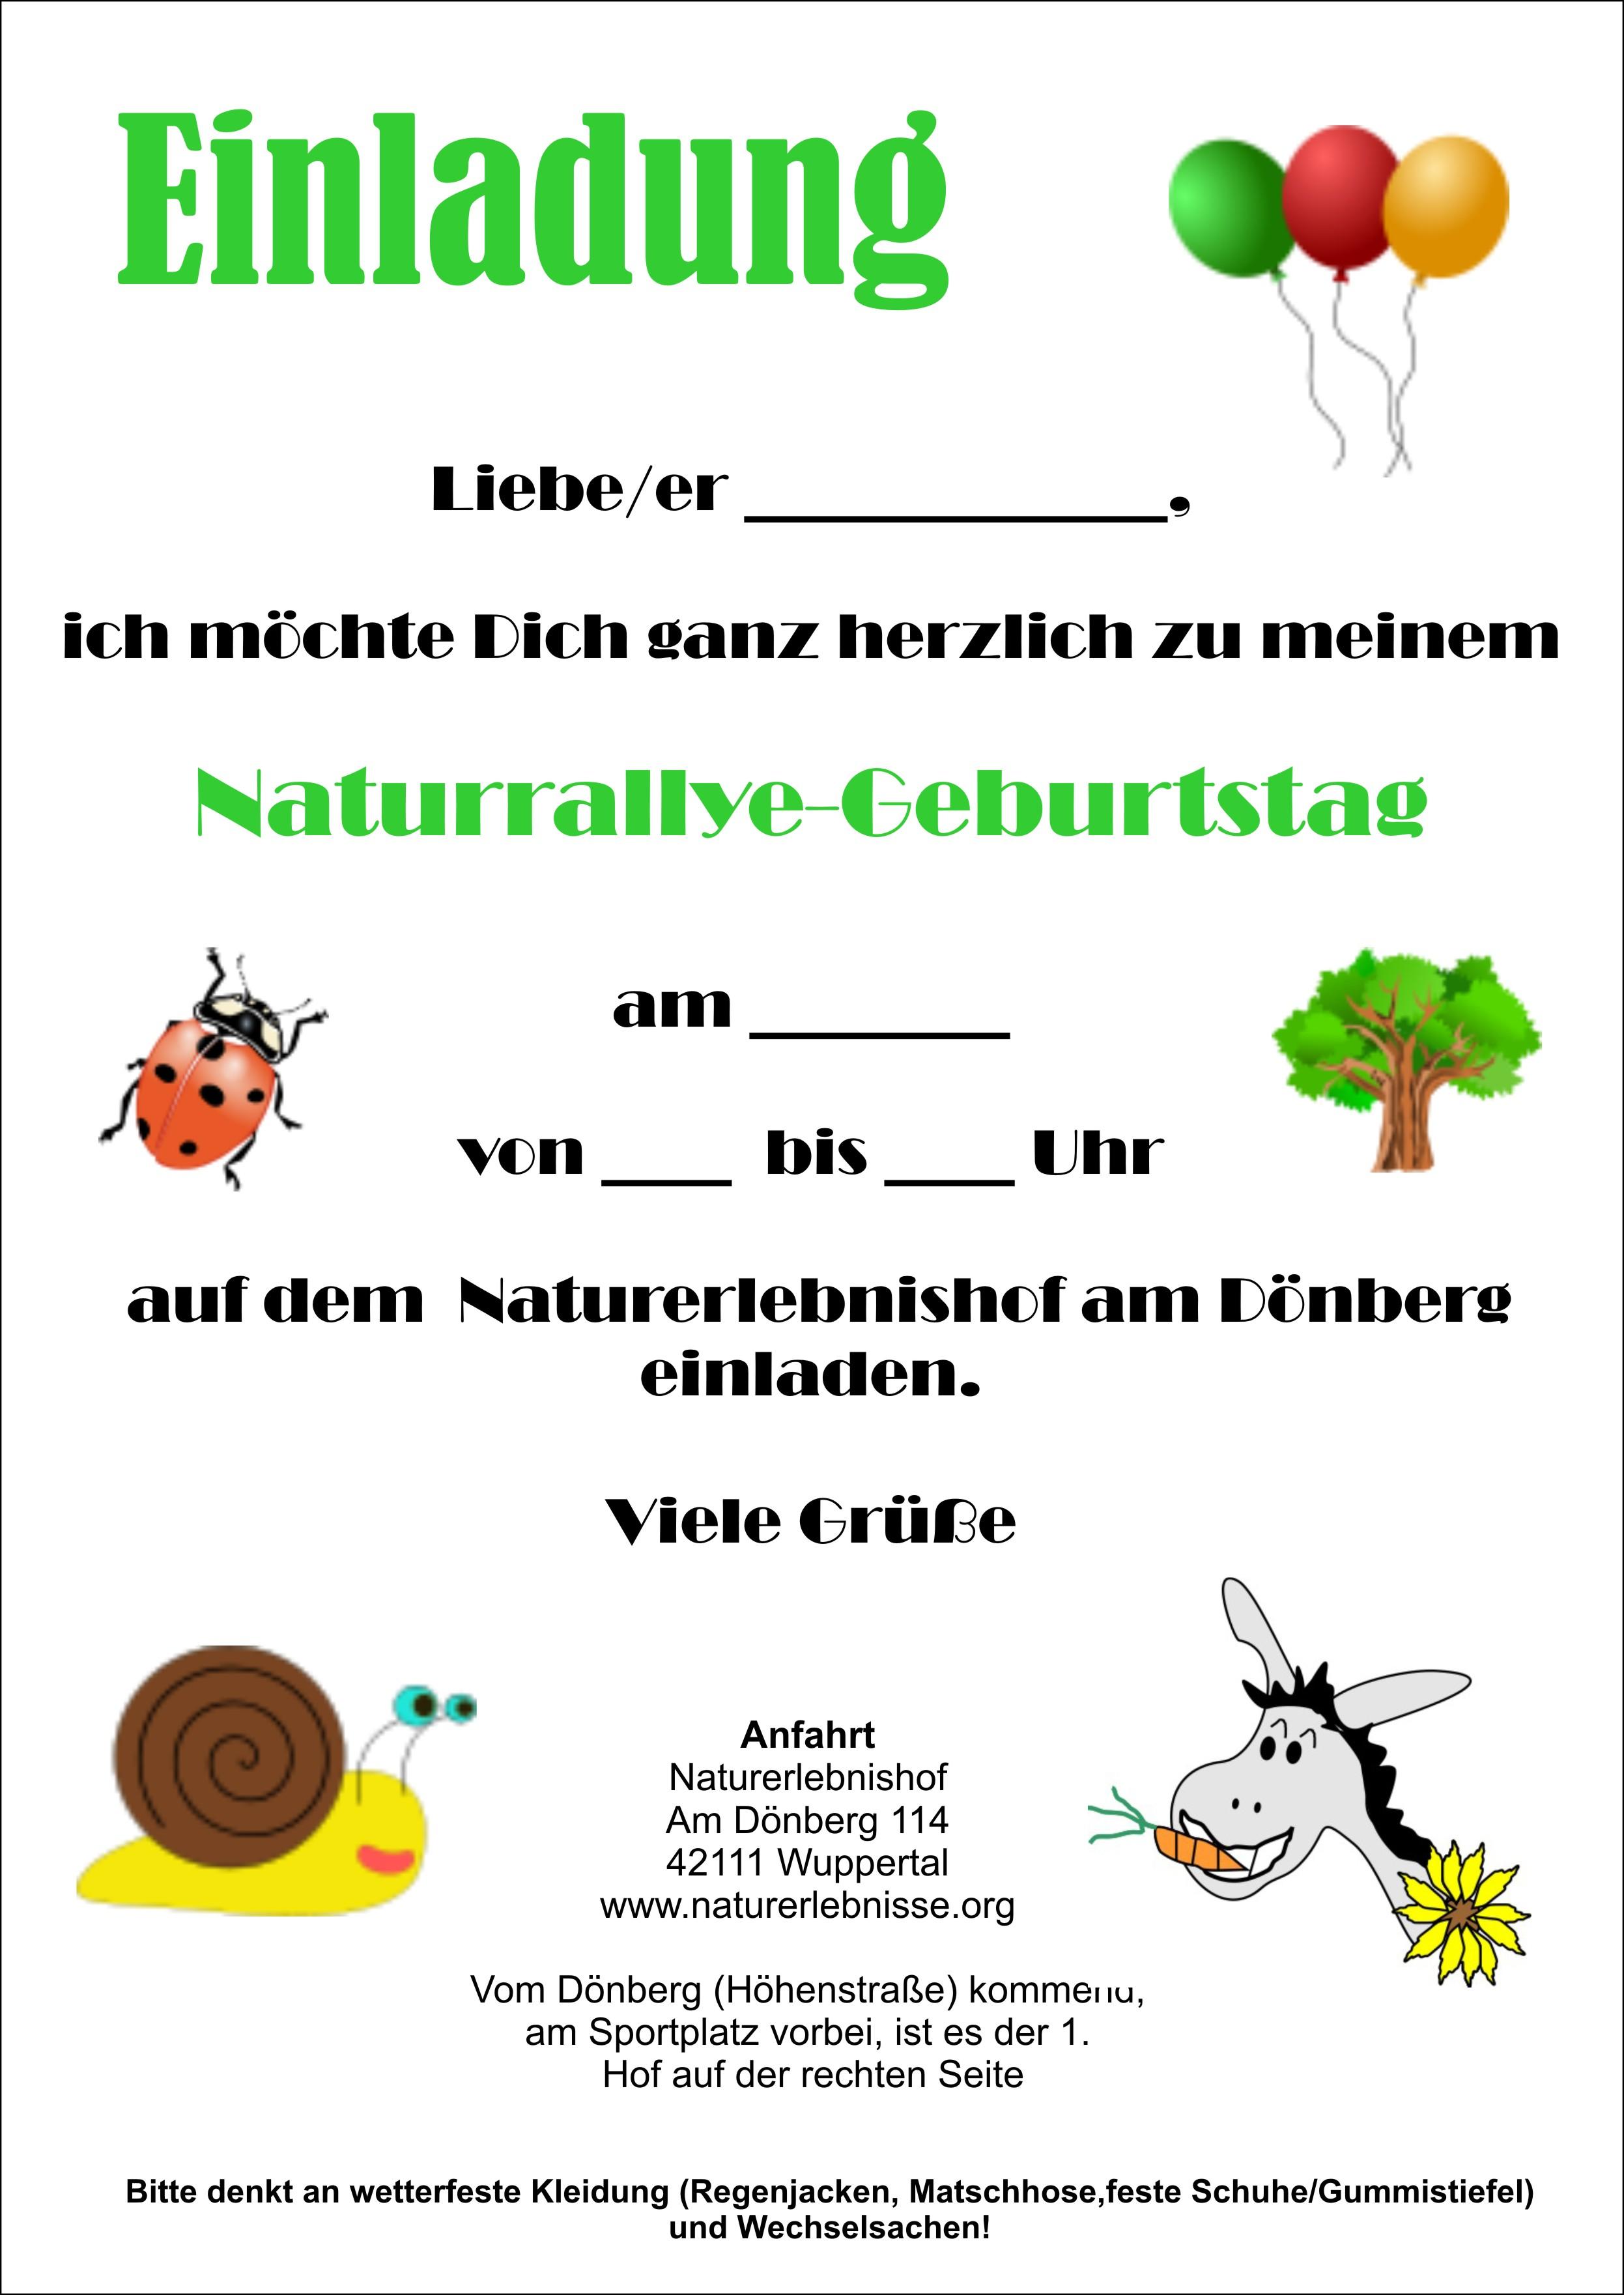 Perfekt Einladung Kindergeburtstag Natur U2013 Cloudhash, Einladungs